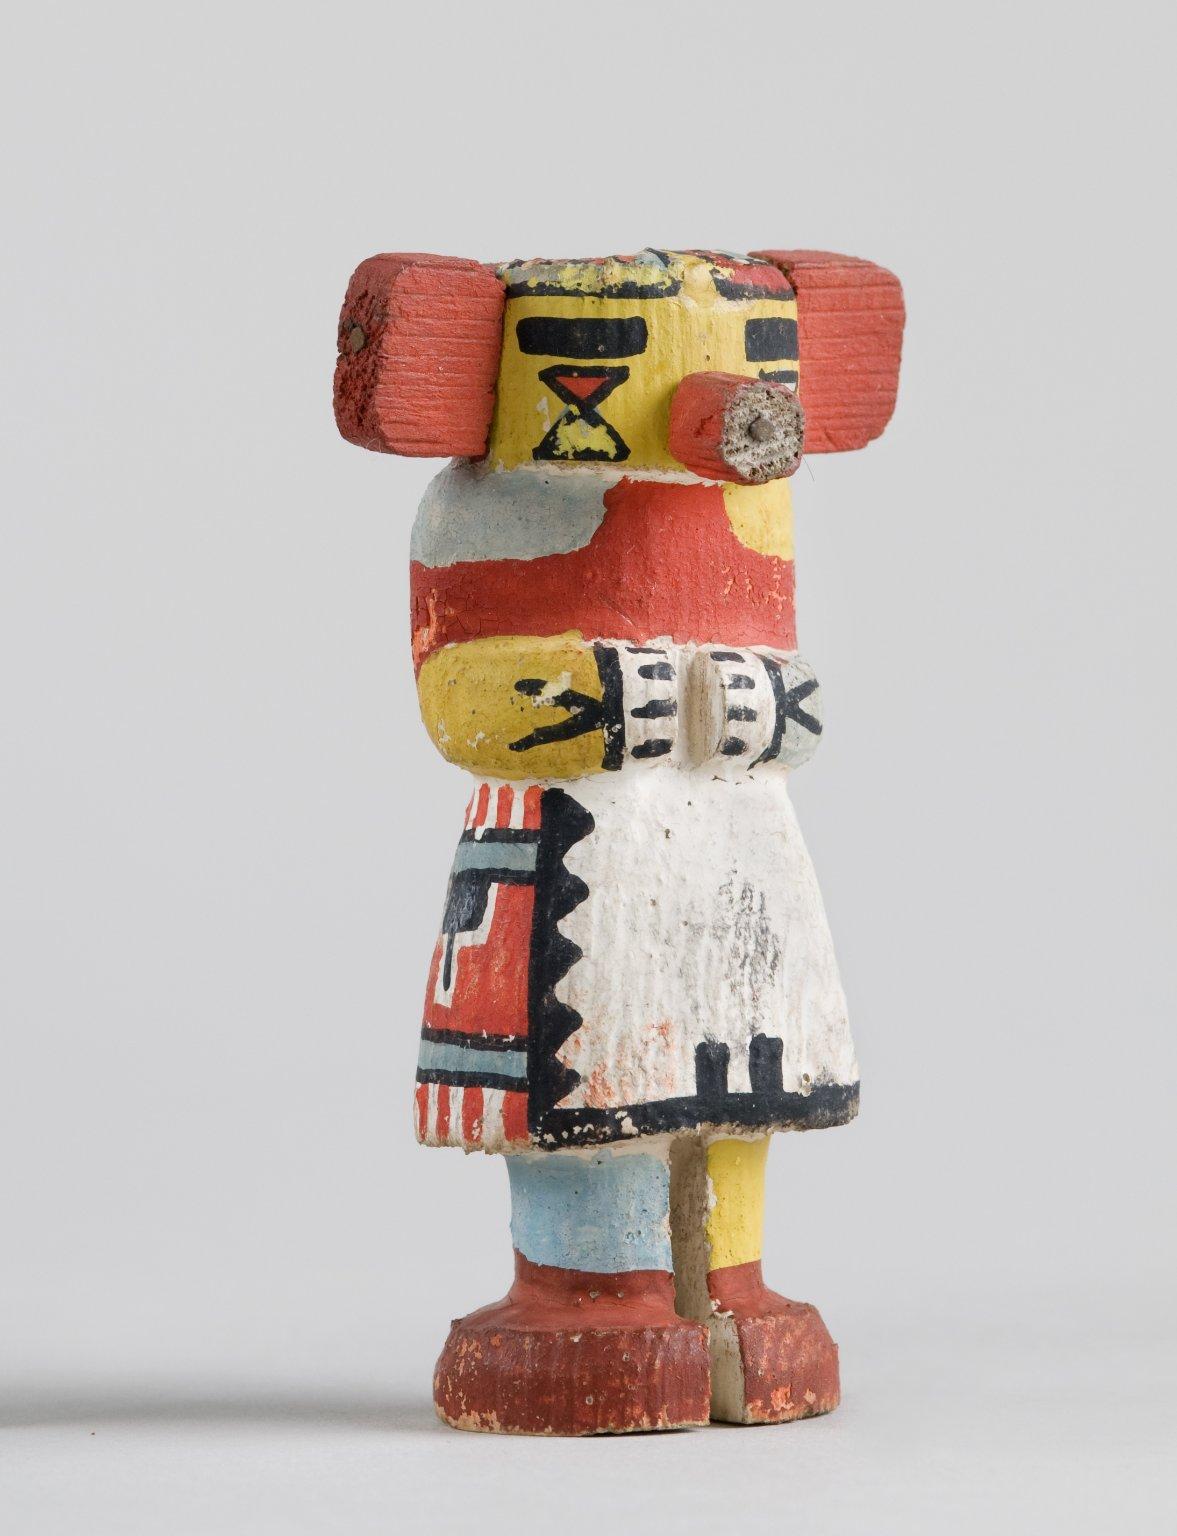 Wukoqala Kachina Doll